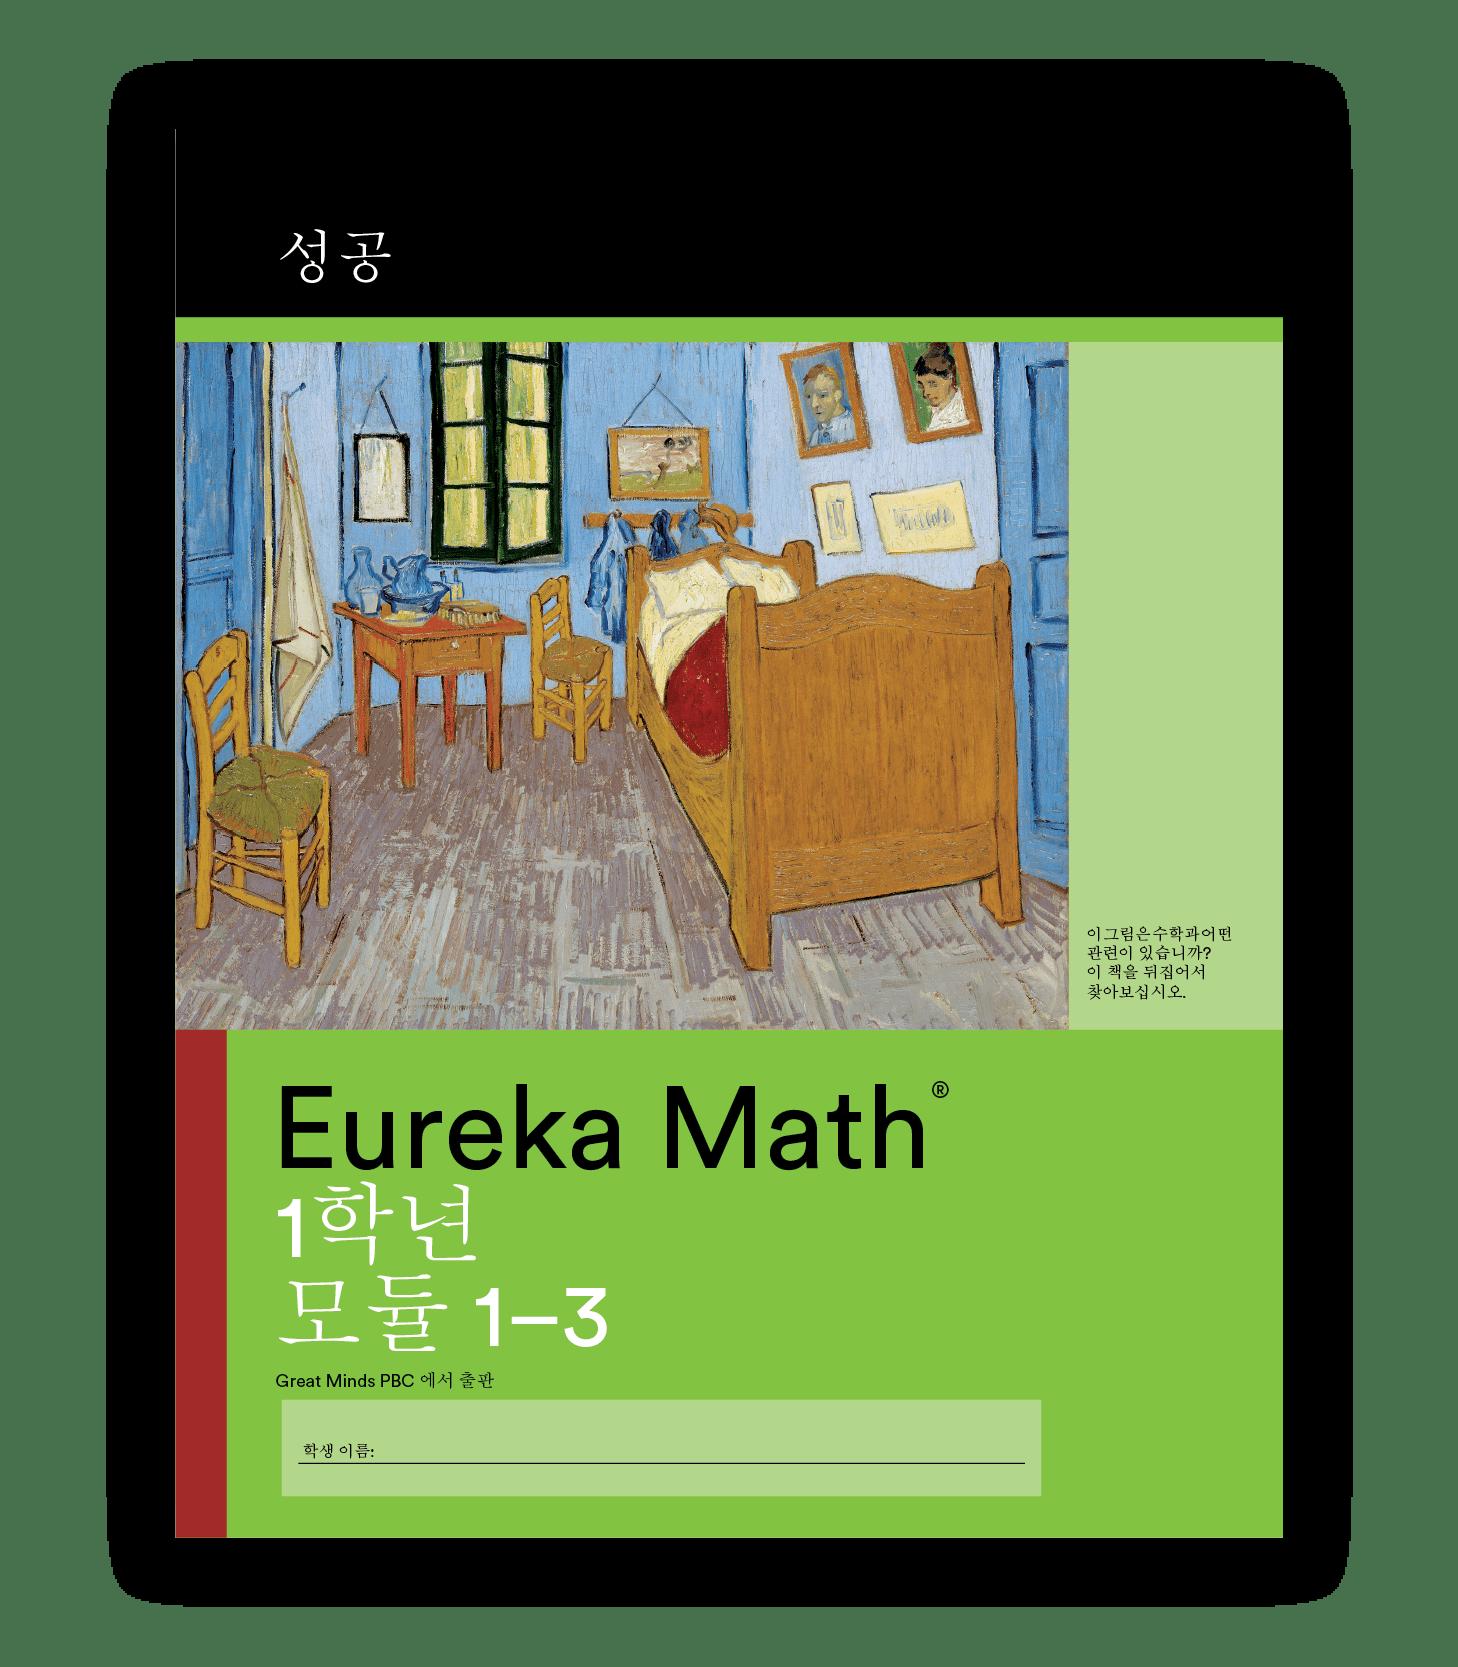 Eureka Math Succeed Book in Korean for Grade 1